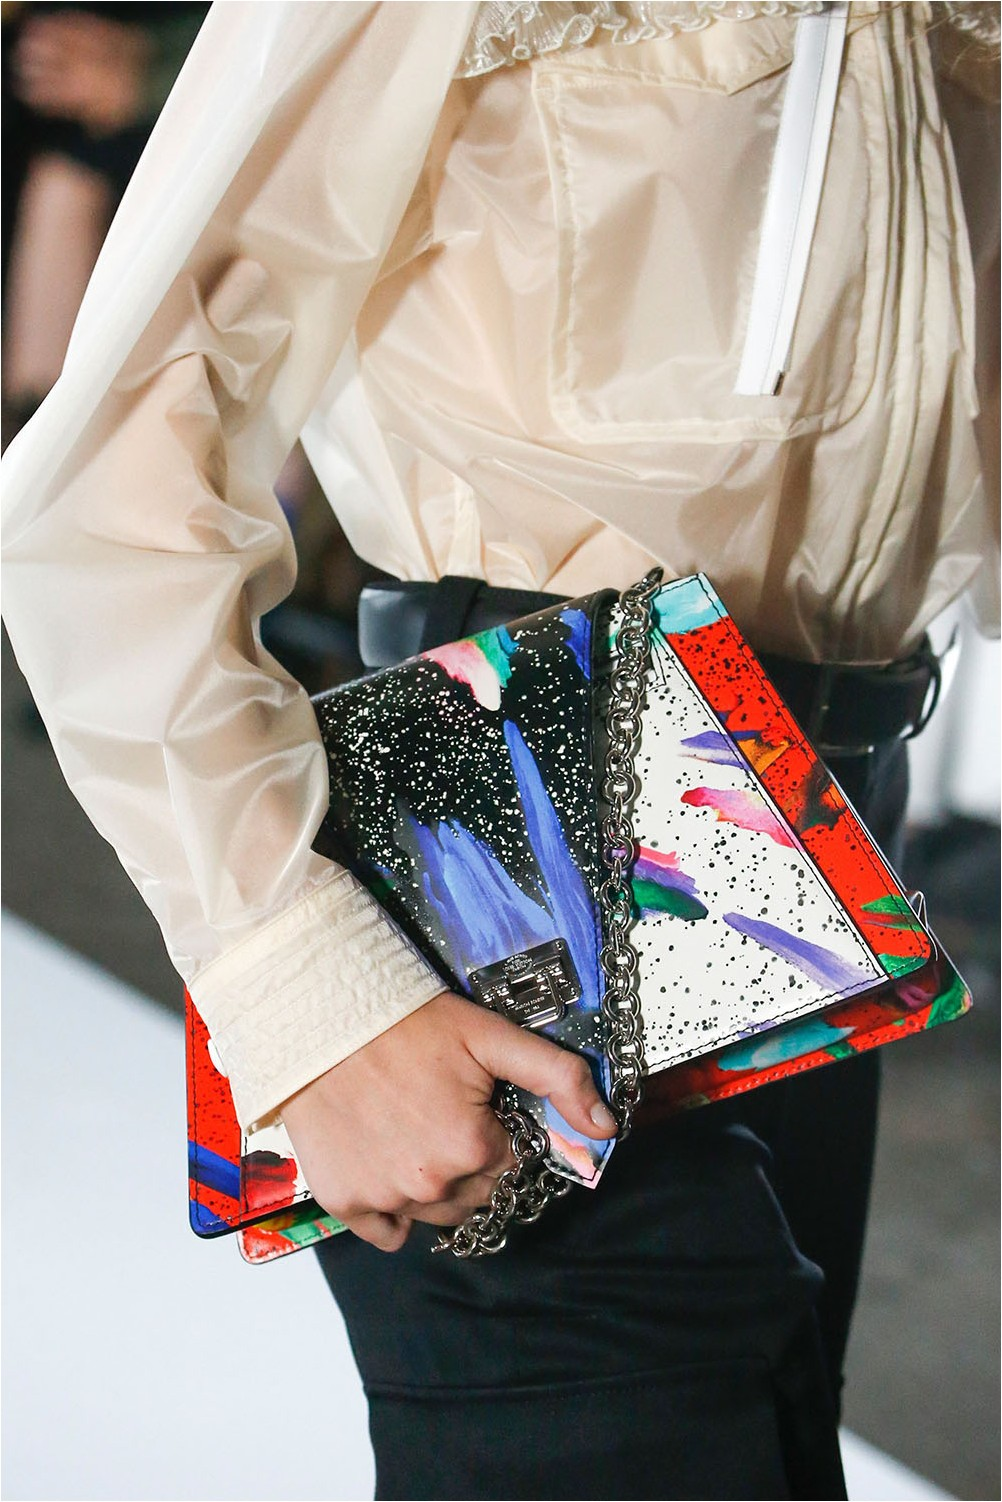 Жив печат на Louis Vuitton